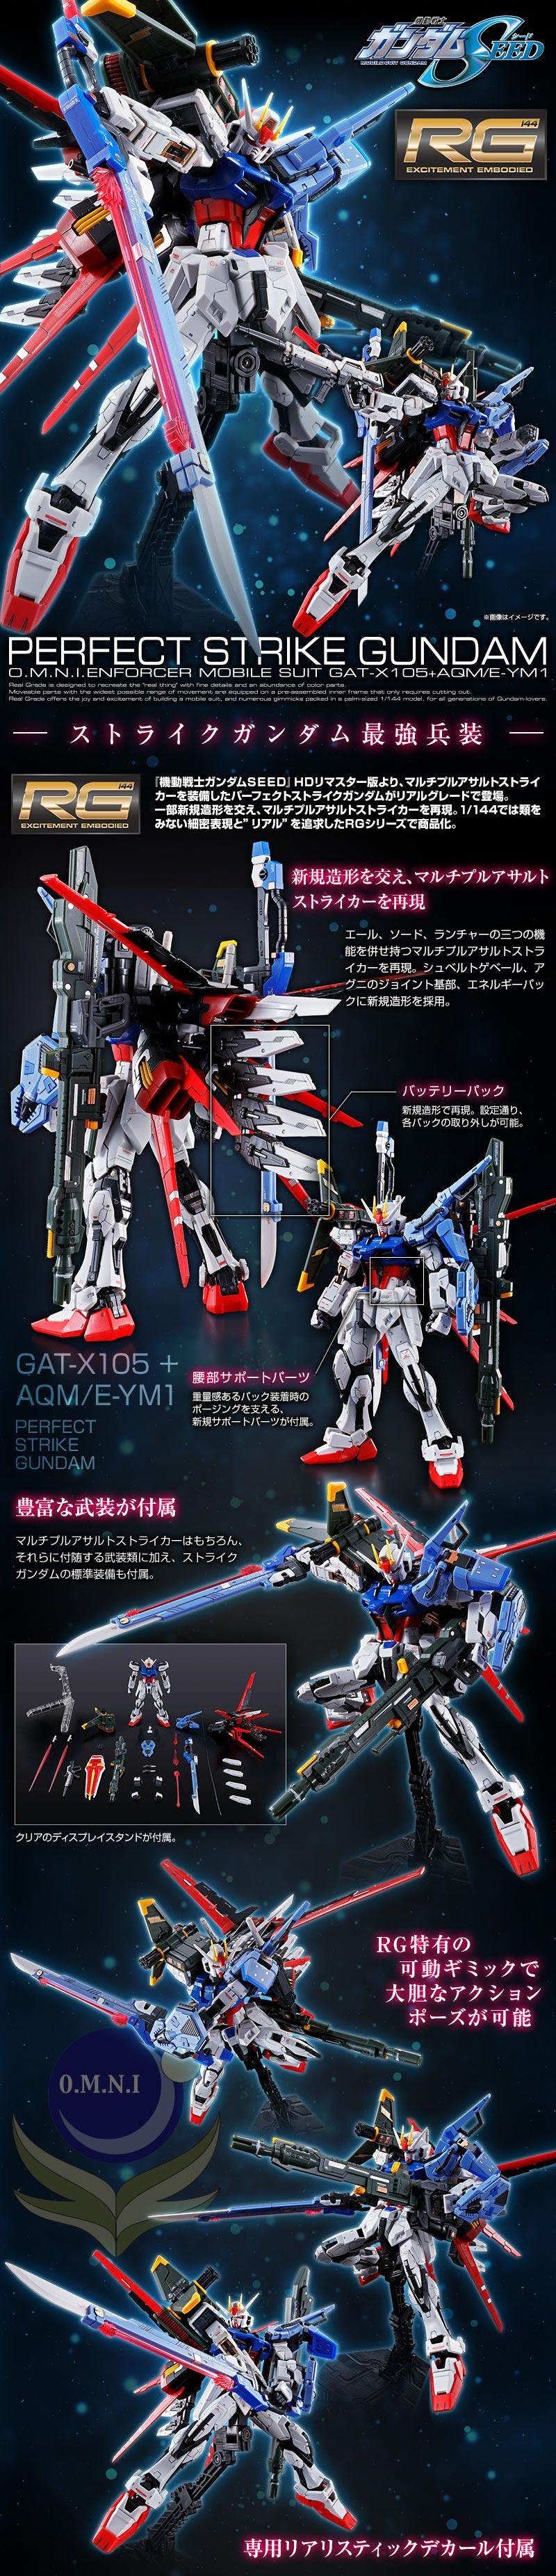 RG Perfect Strike Gundam Details